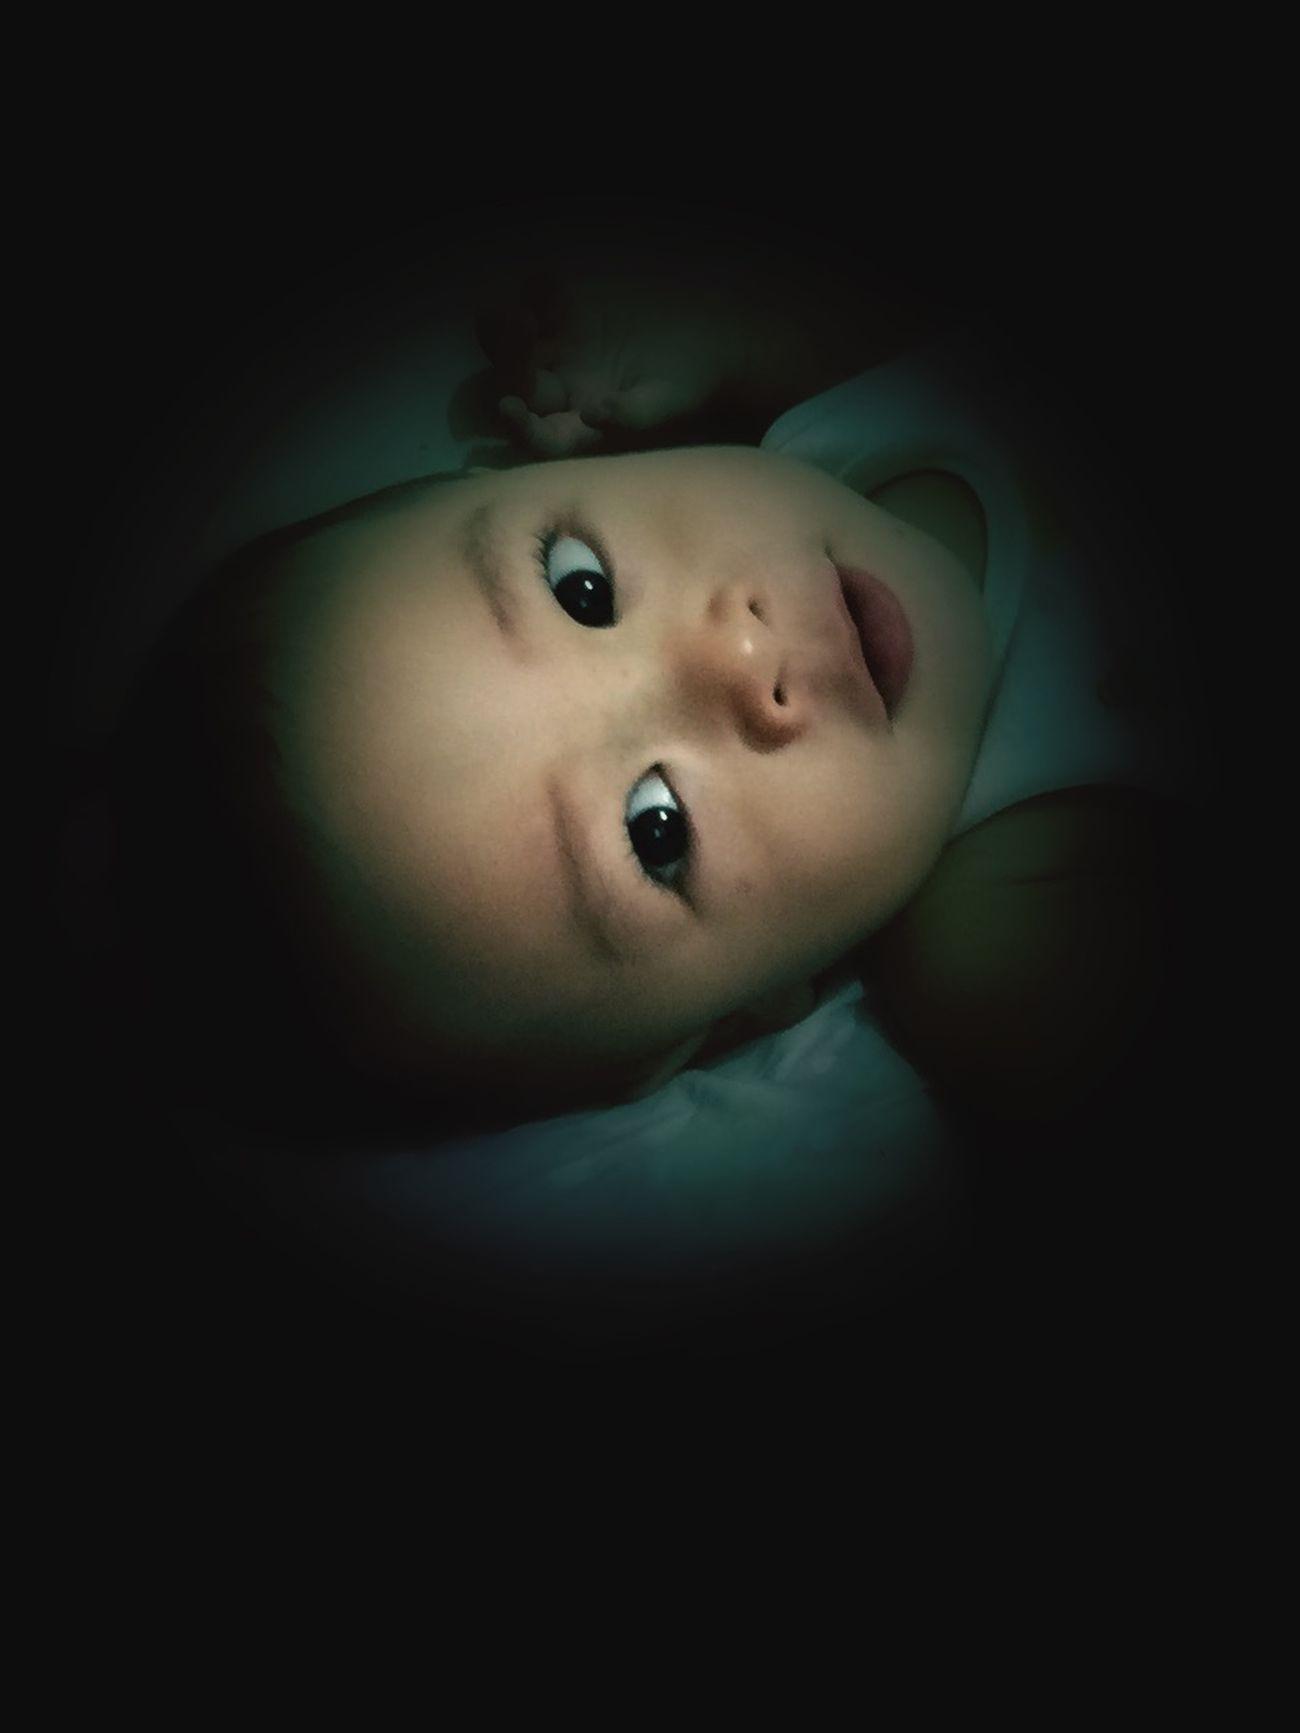 Cassius FamilyTime Family❤ Nephewlove